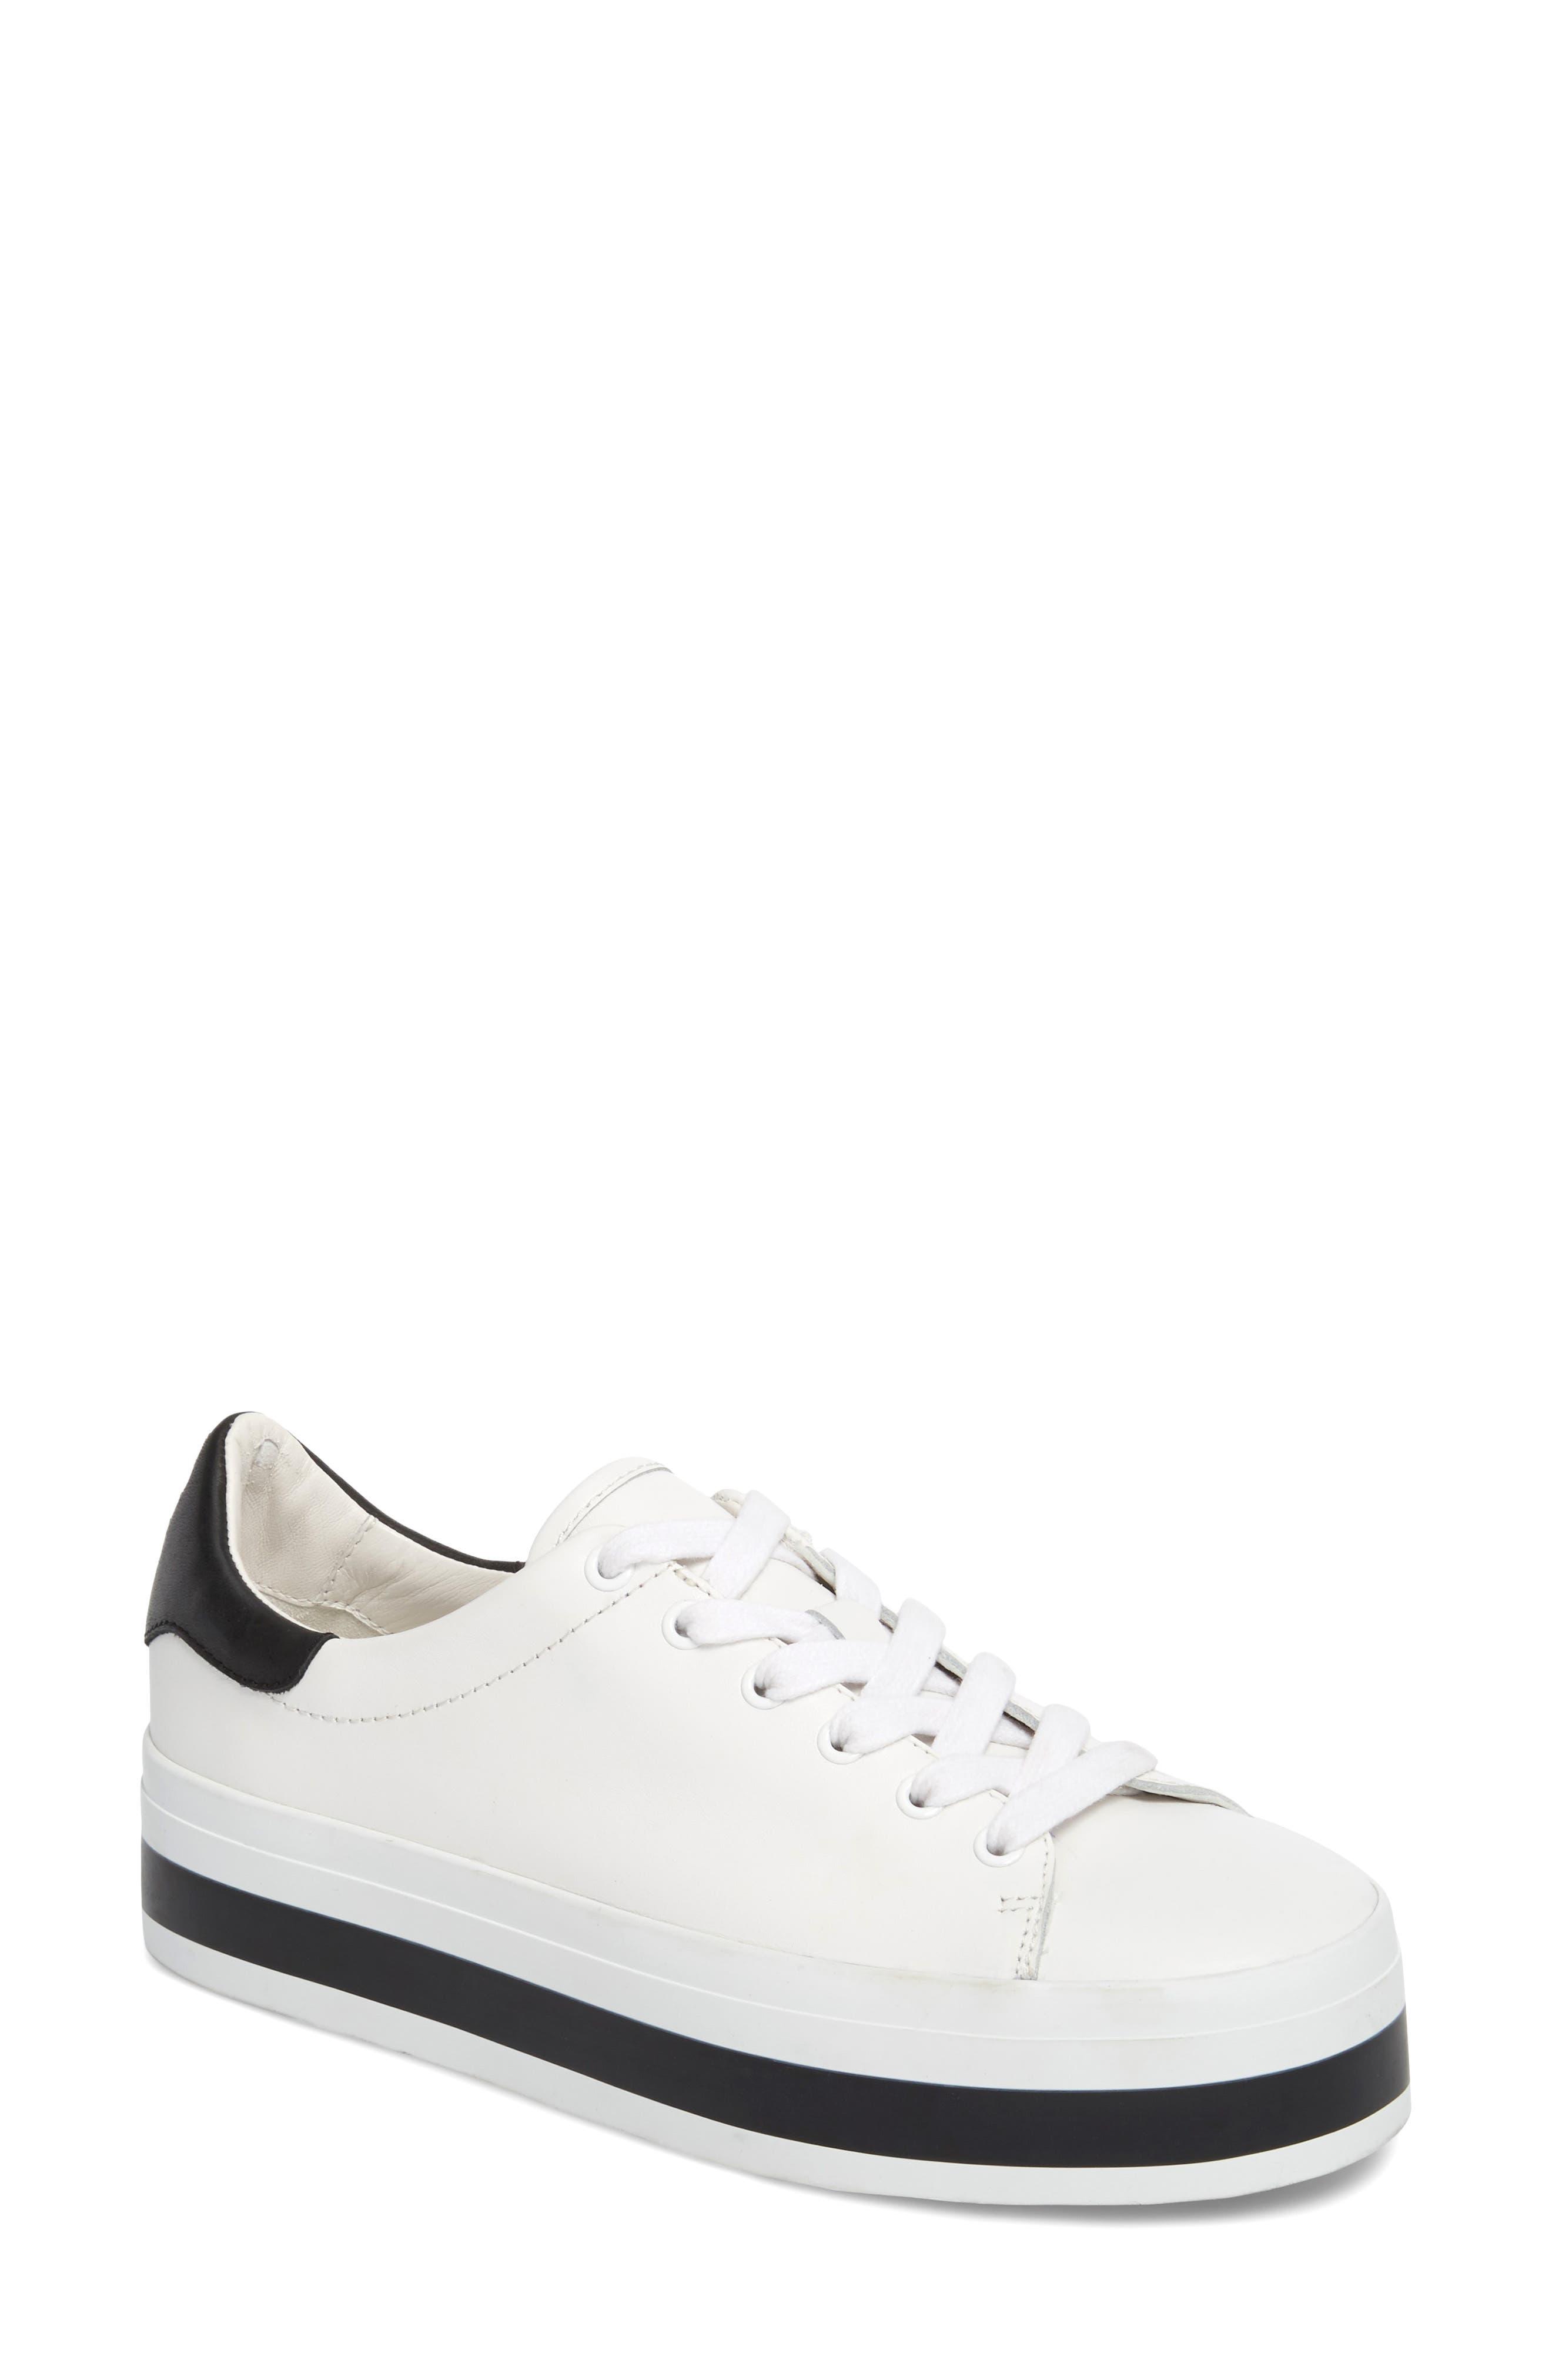 Alice + Olivia Ezra Flatform Sneaker, White